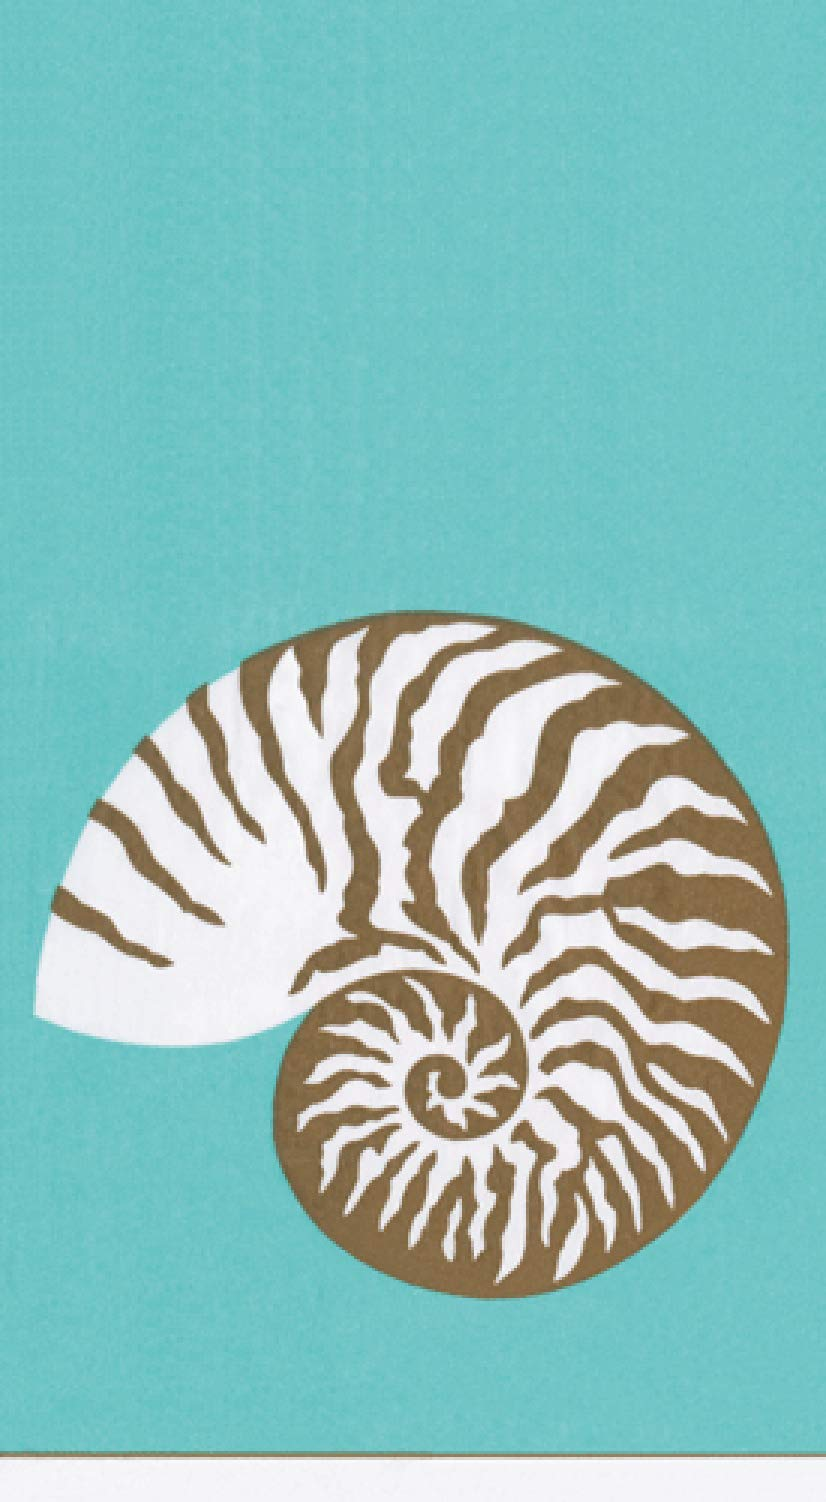 Caspari 3-Ply Paper Nautilus Turquoise, 15 Count Guest Towel Napkins, Set of 2